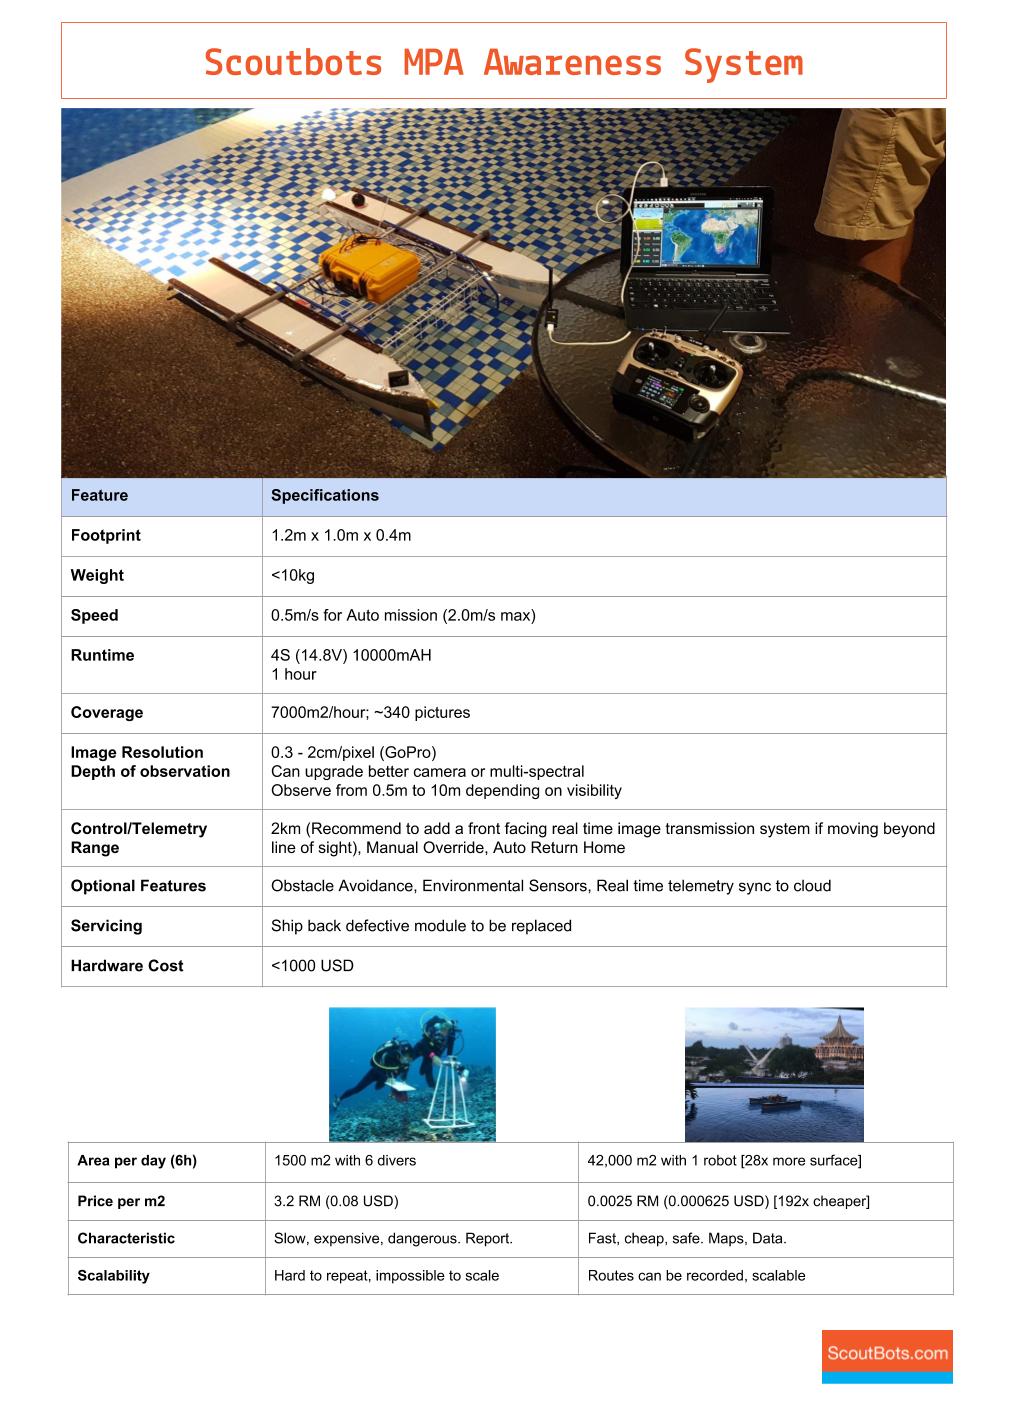 Scoutbots Kuching A4 printing .png